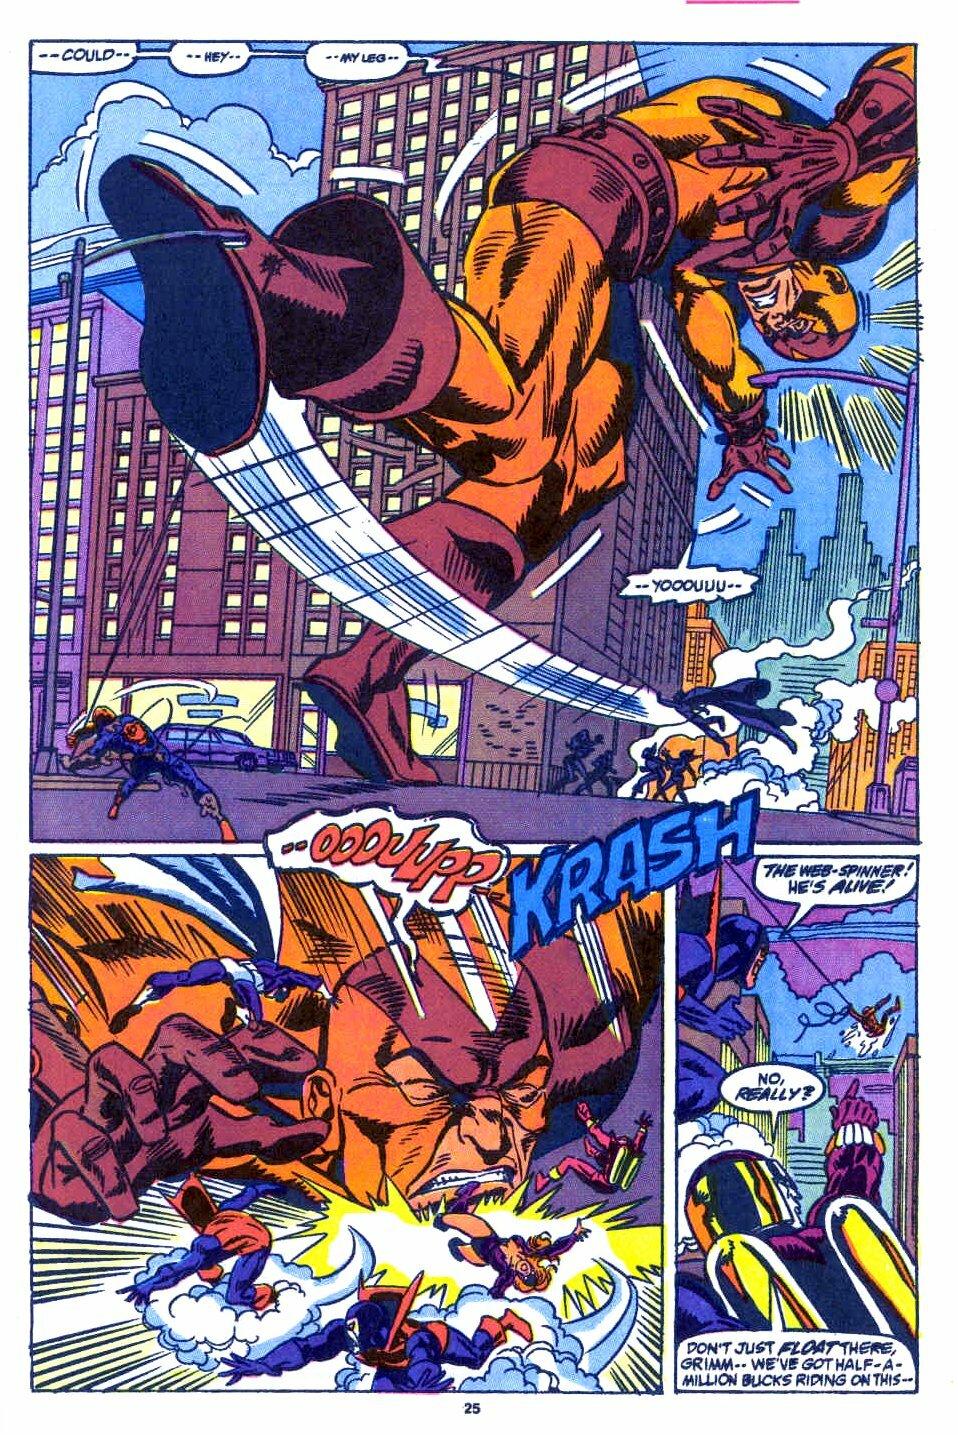 Web of Spider-Man #64